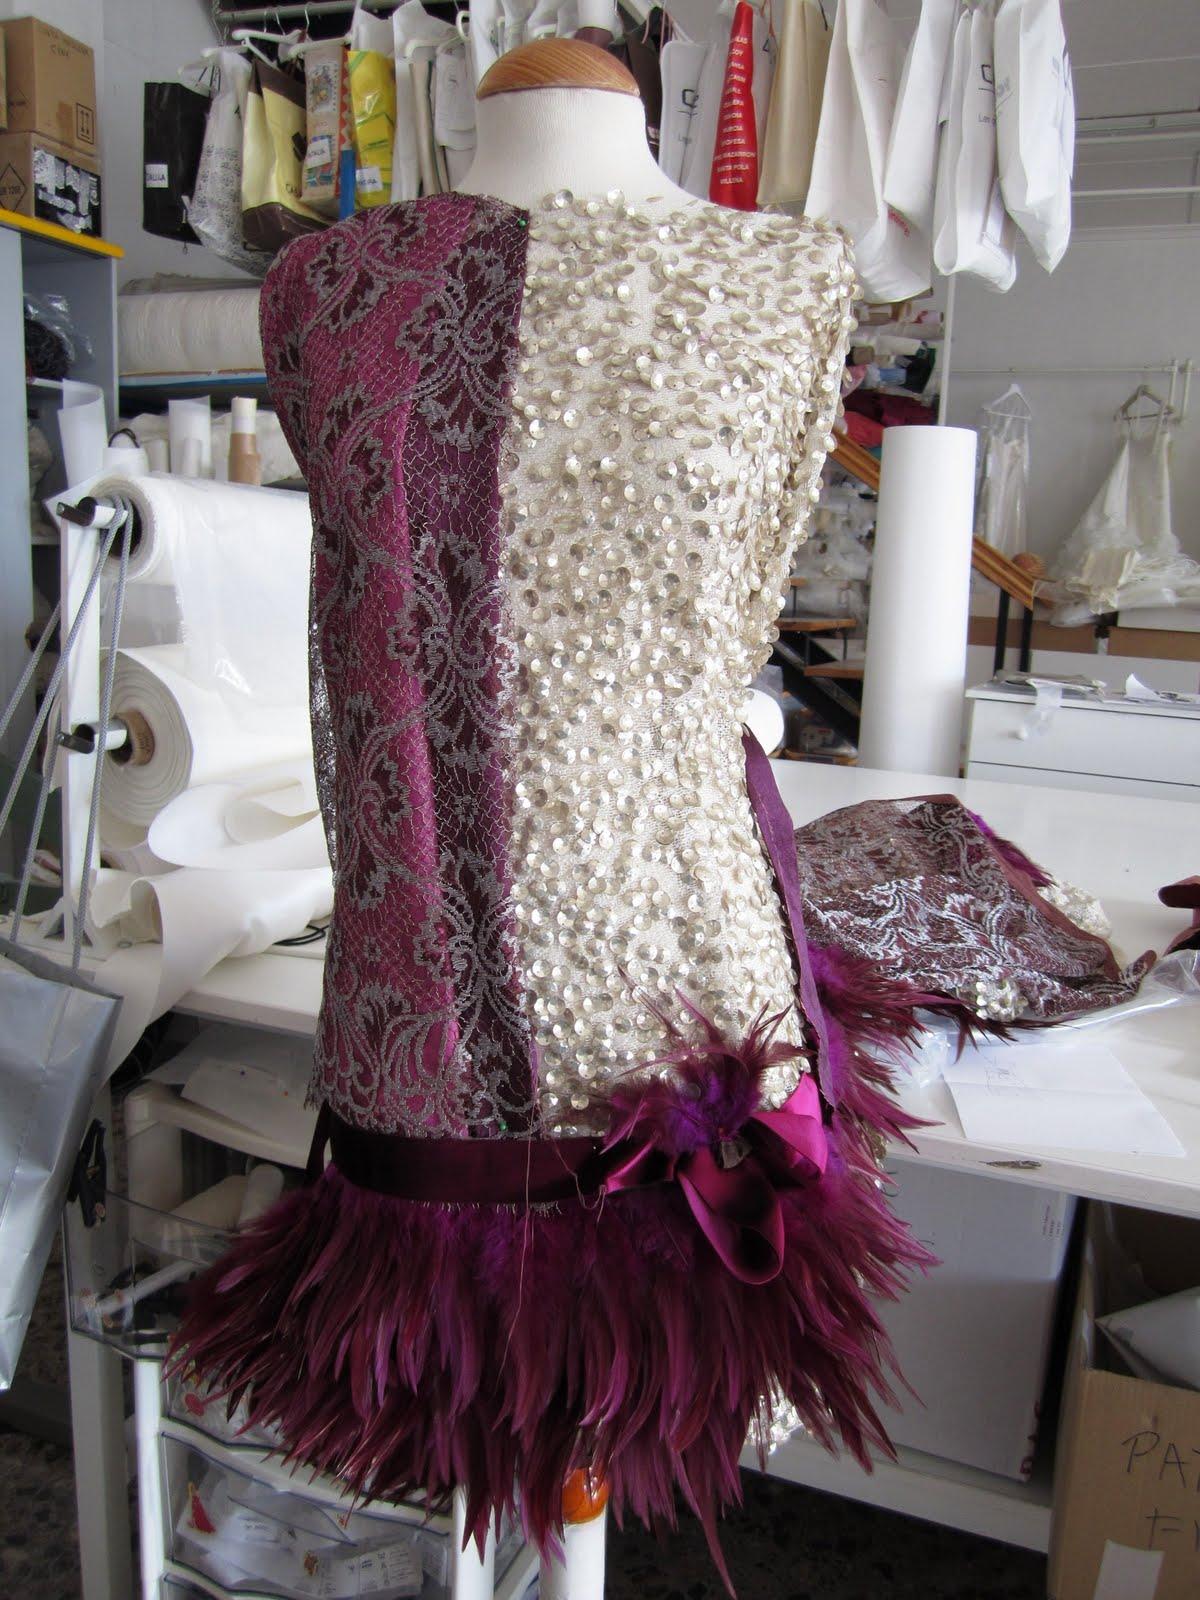 Un vestido a os 20 qu tejido te gusta m s valdespastor - Fiesta anos 20 ...